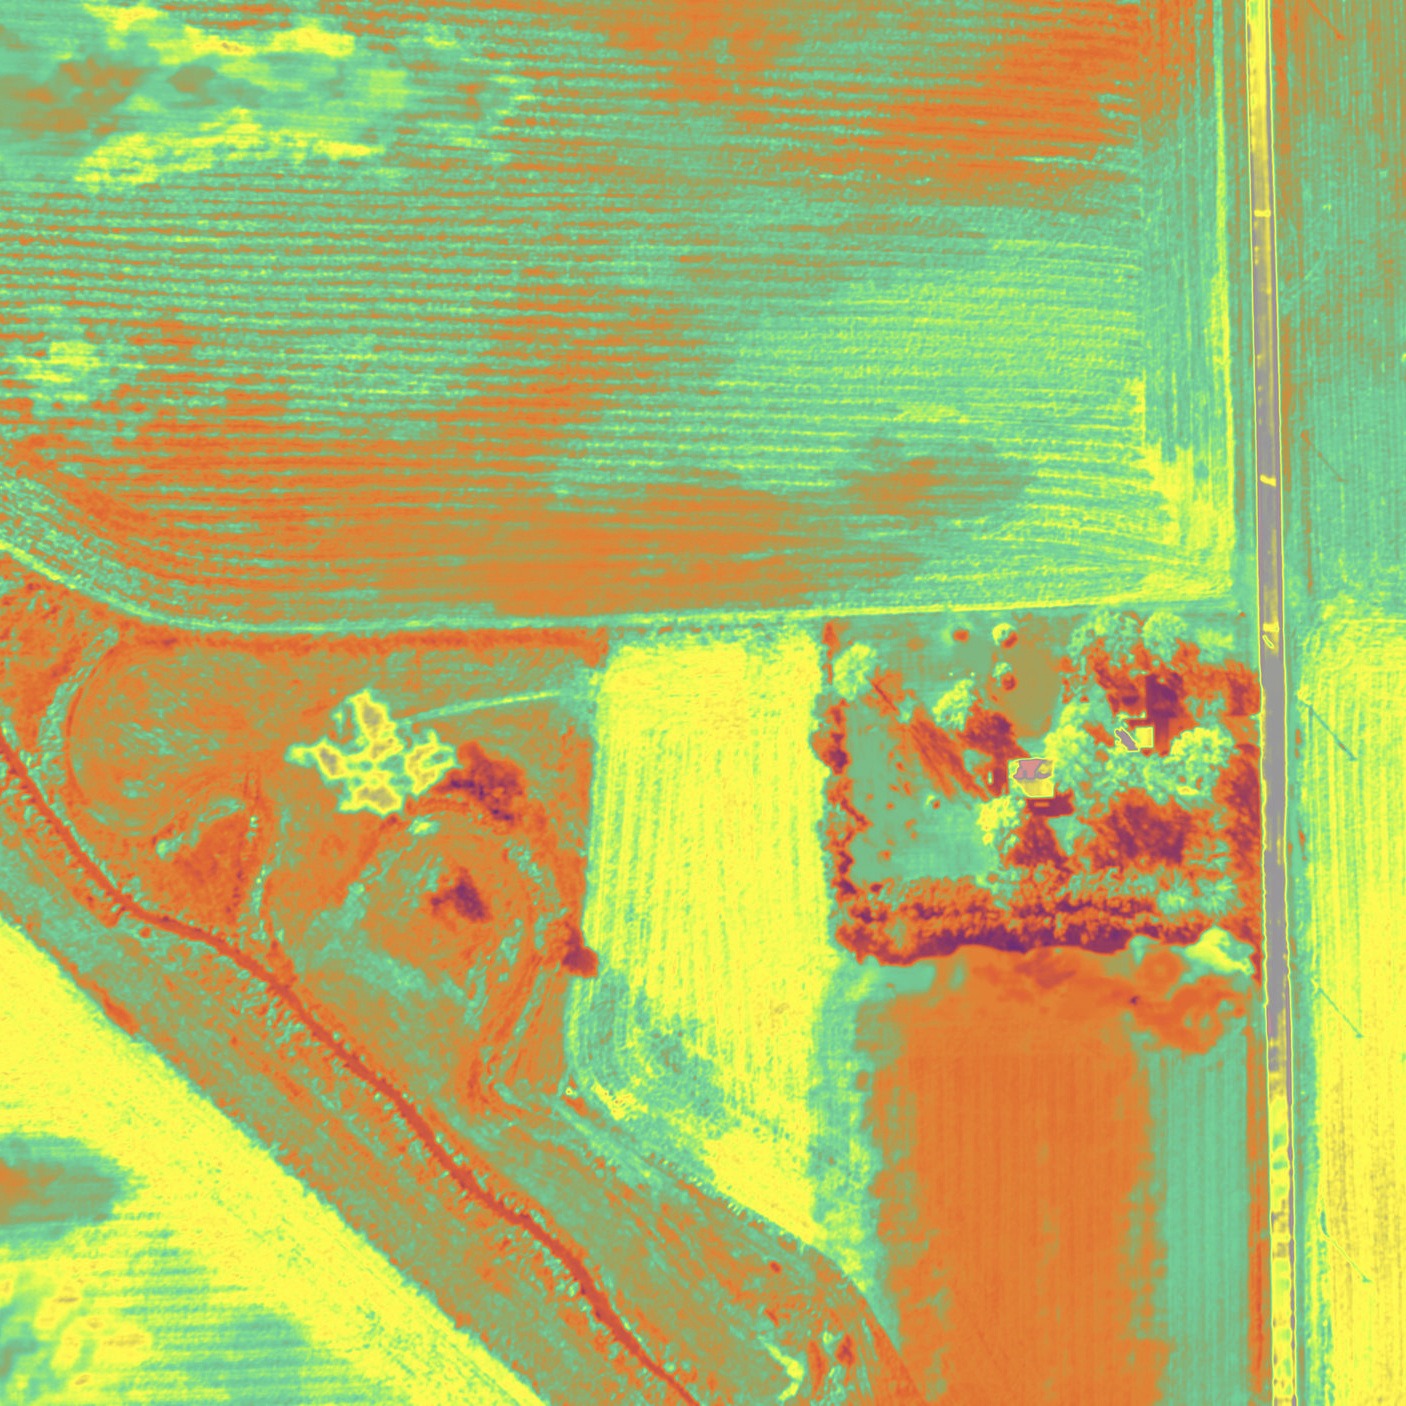 drone+imaging.jpg